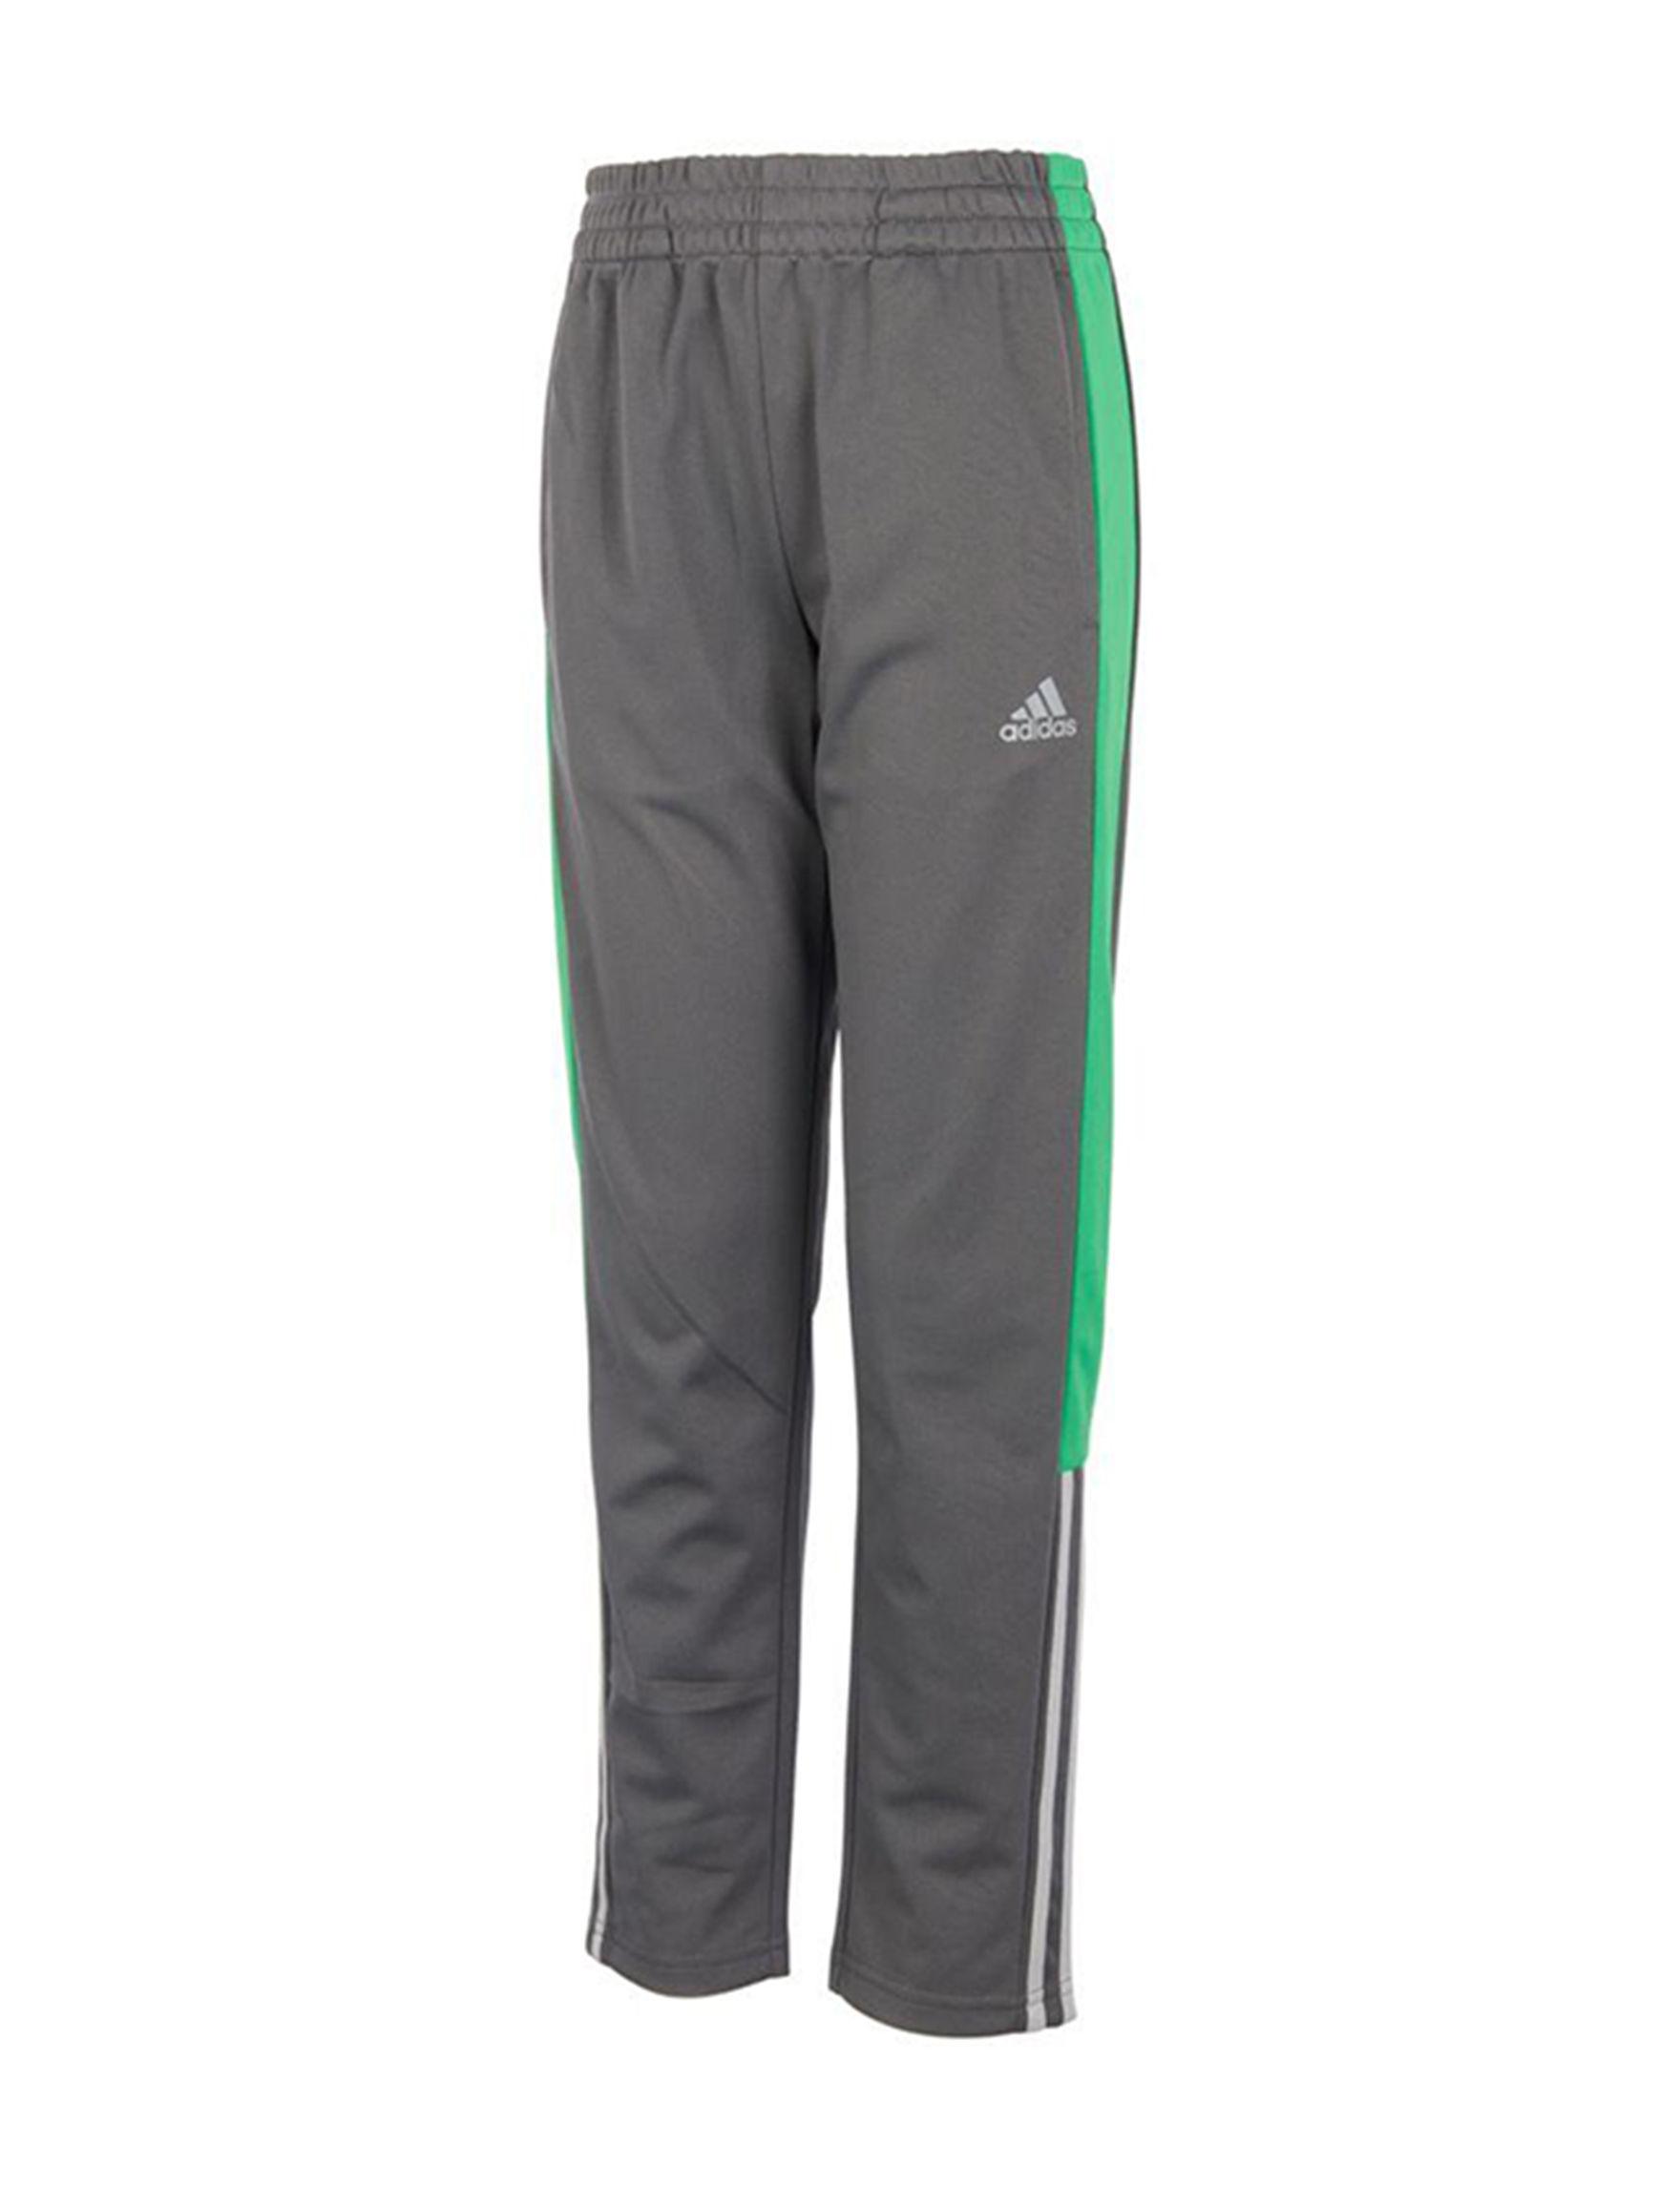 Adidas Dark Grey Soft Pants